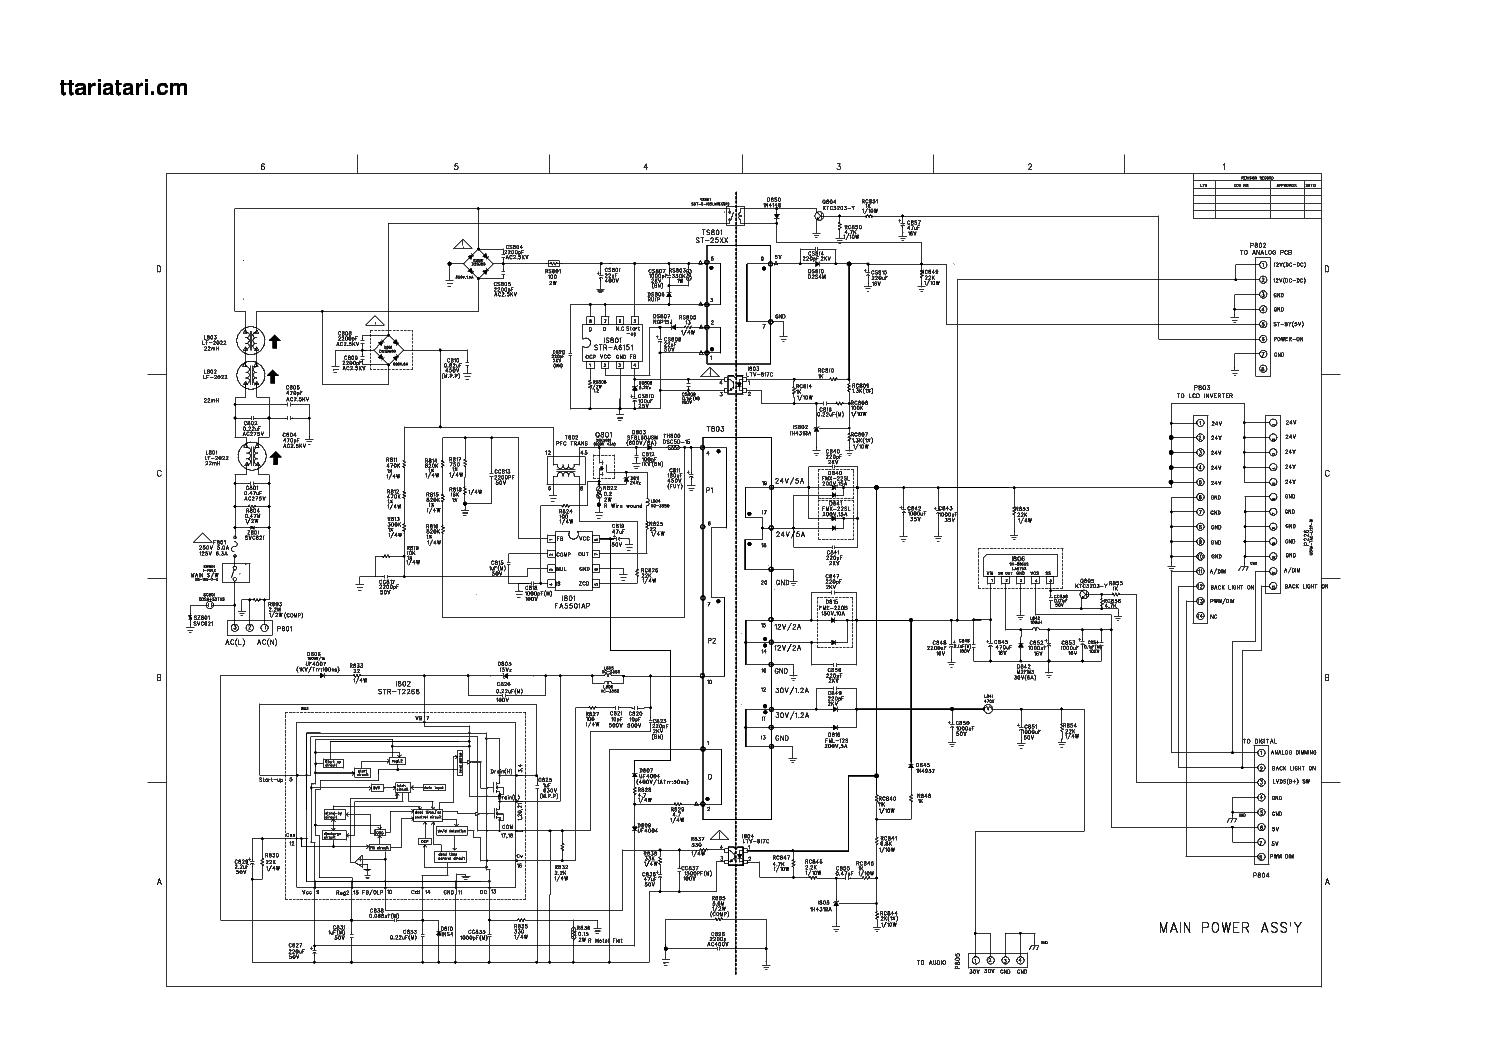 Power Supply Usage